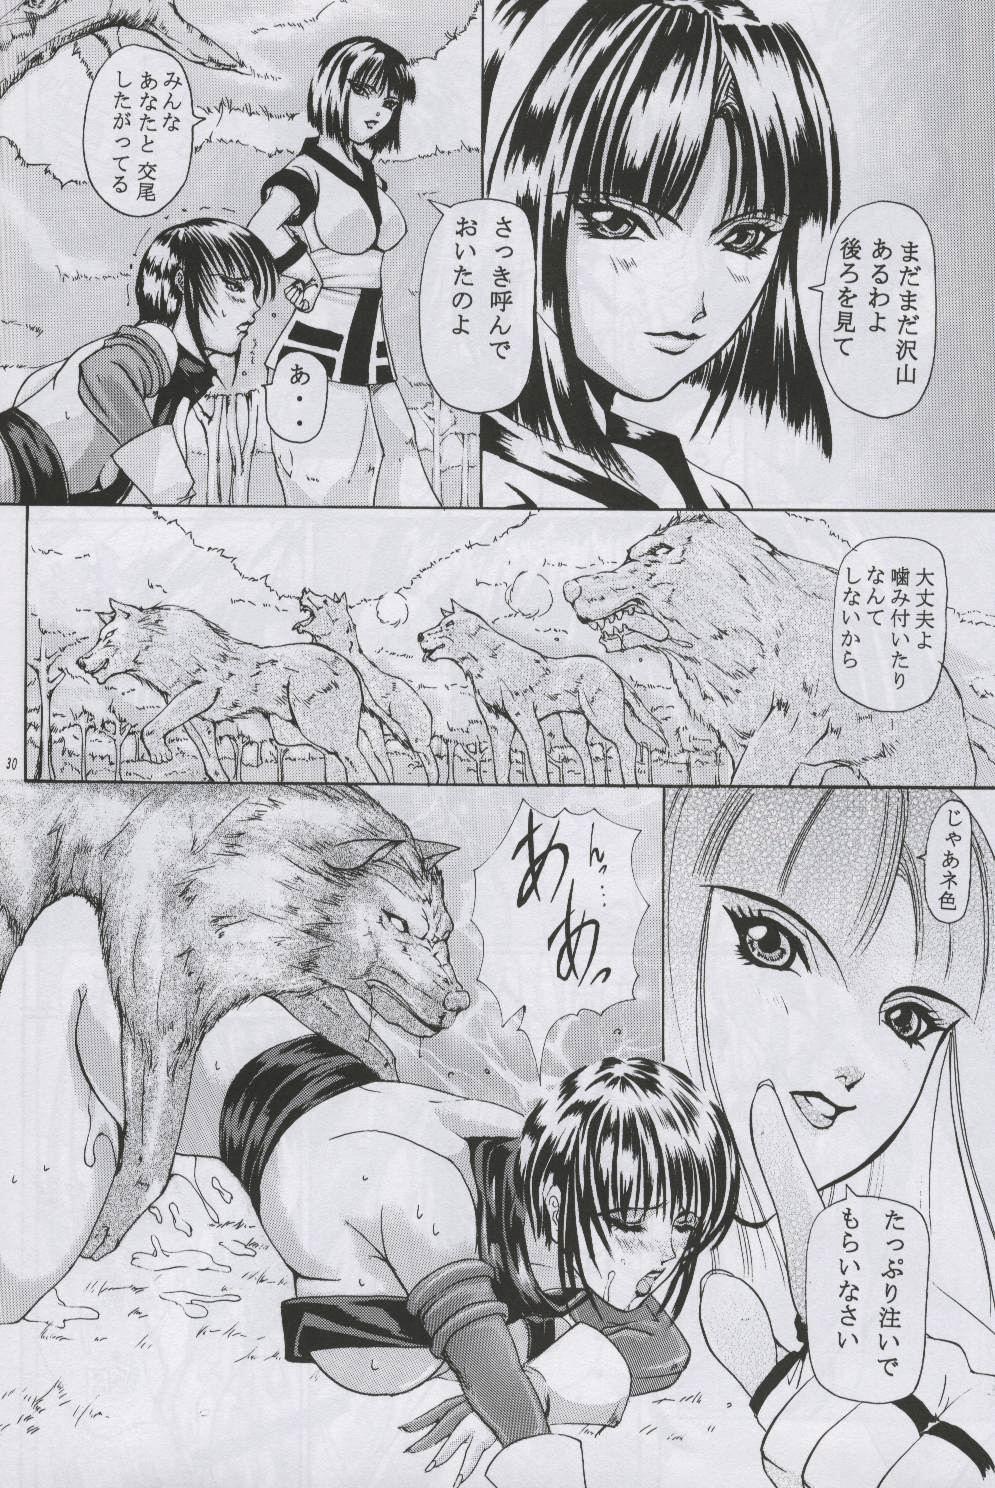 [LUCRETiA (Hiichan)] Ken-Jyuu Retouch Version - Le sexe dur avec l'animal. numero:03 (Samurai Spirits) 27